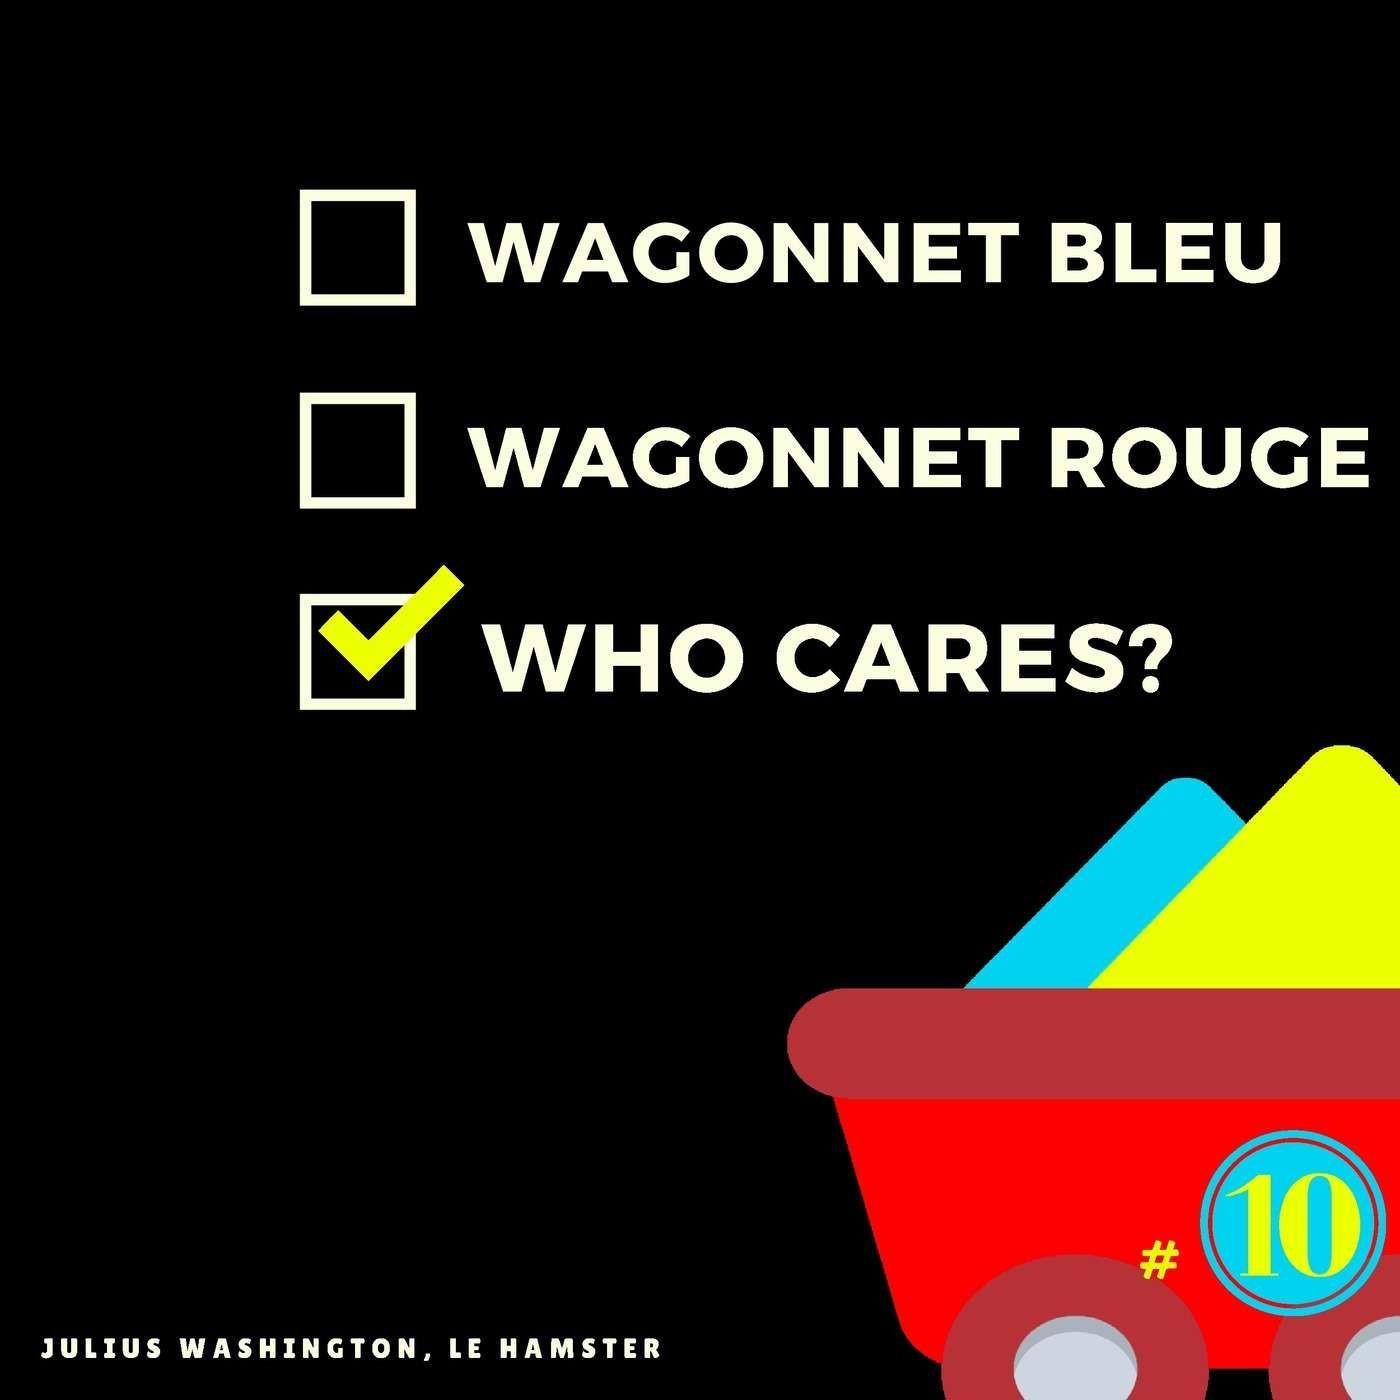 PTS01E10  Les wagonnets